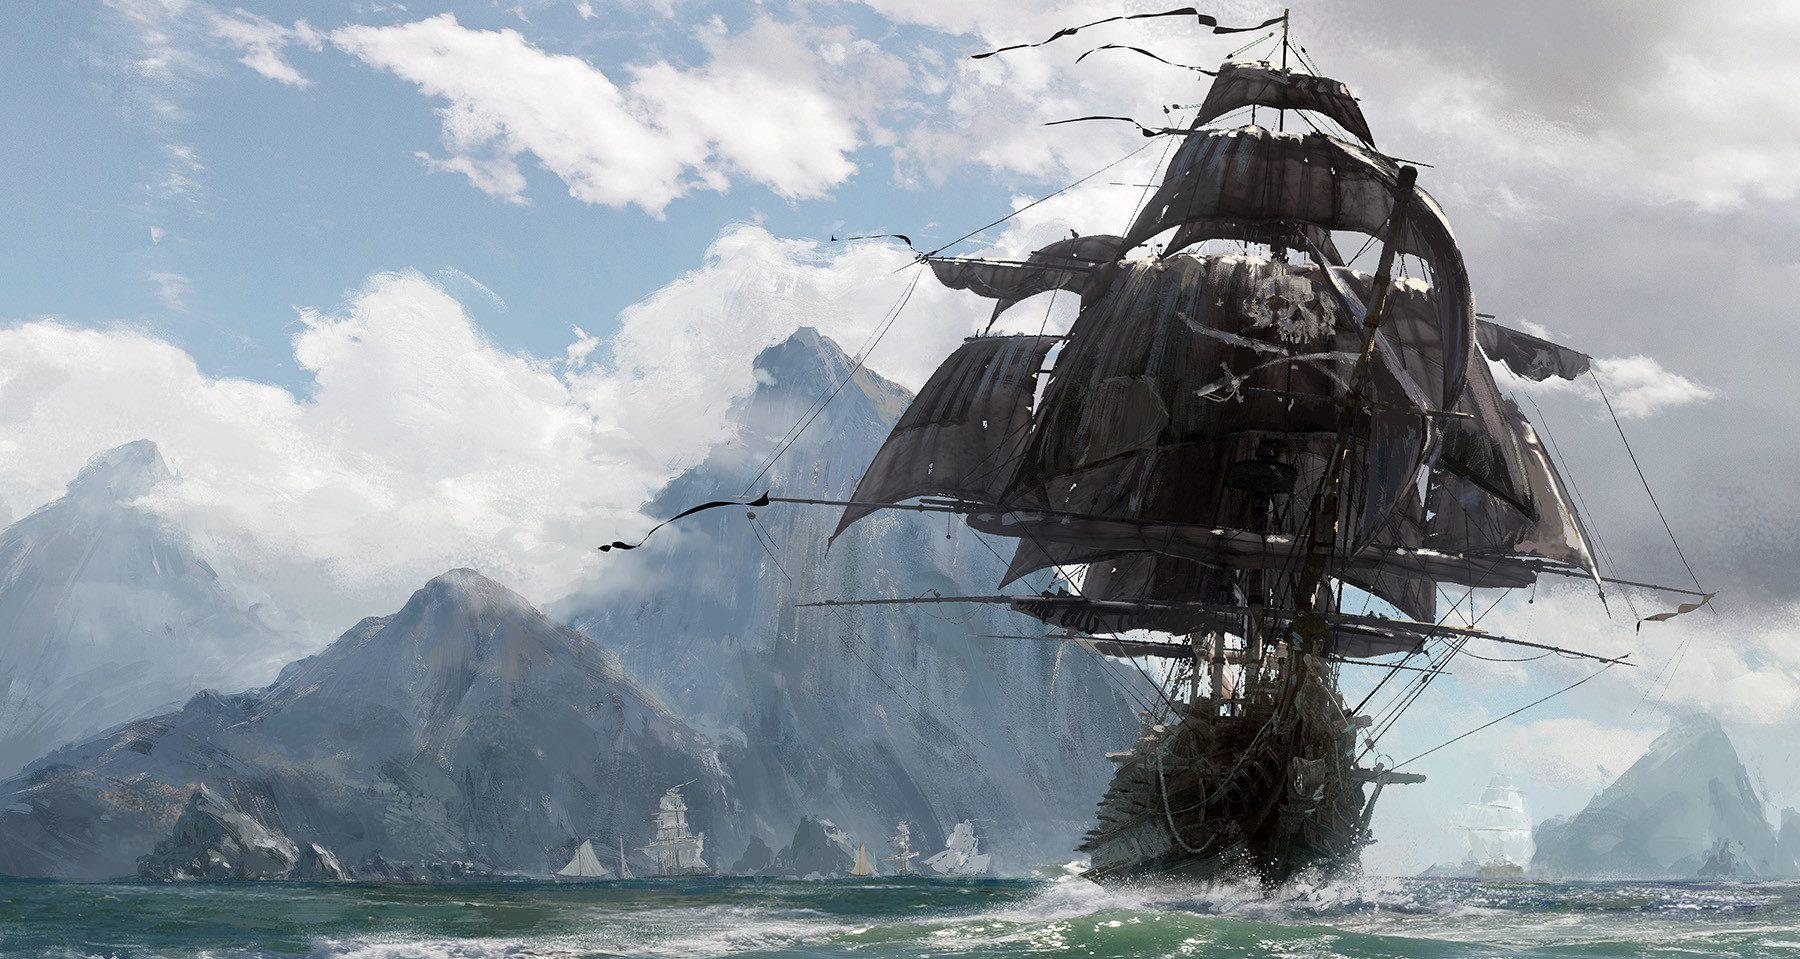 kobe-sek-age-of-sail-concept-low.jpg